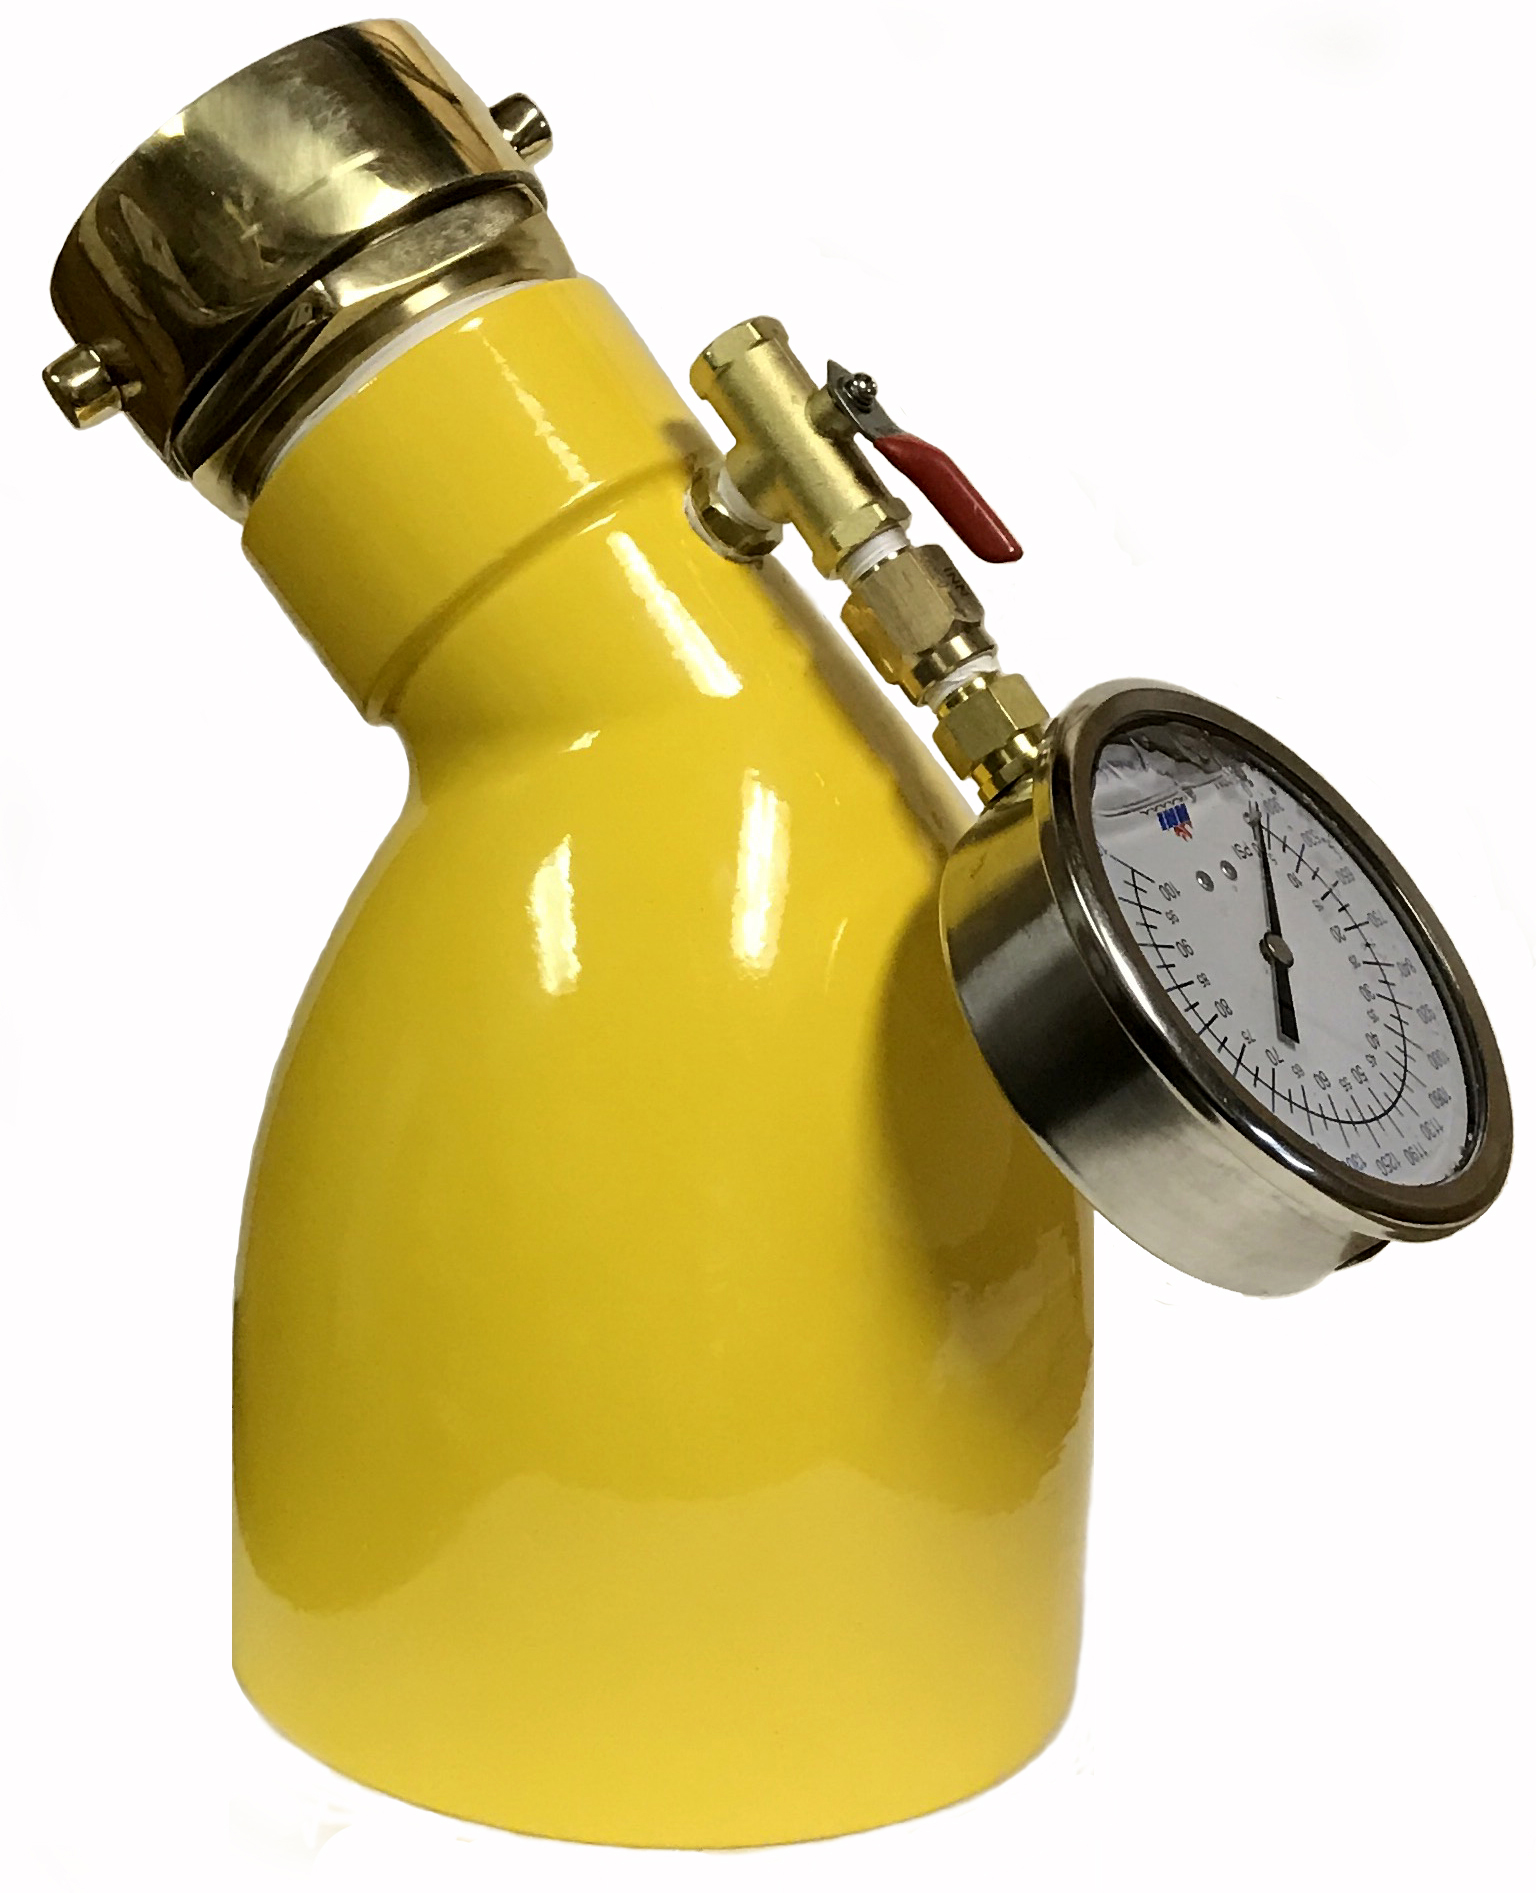 Nni Fire Hydrant Flow Testing Swivel Diffusers